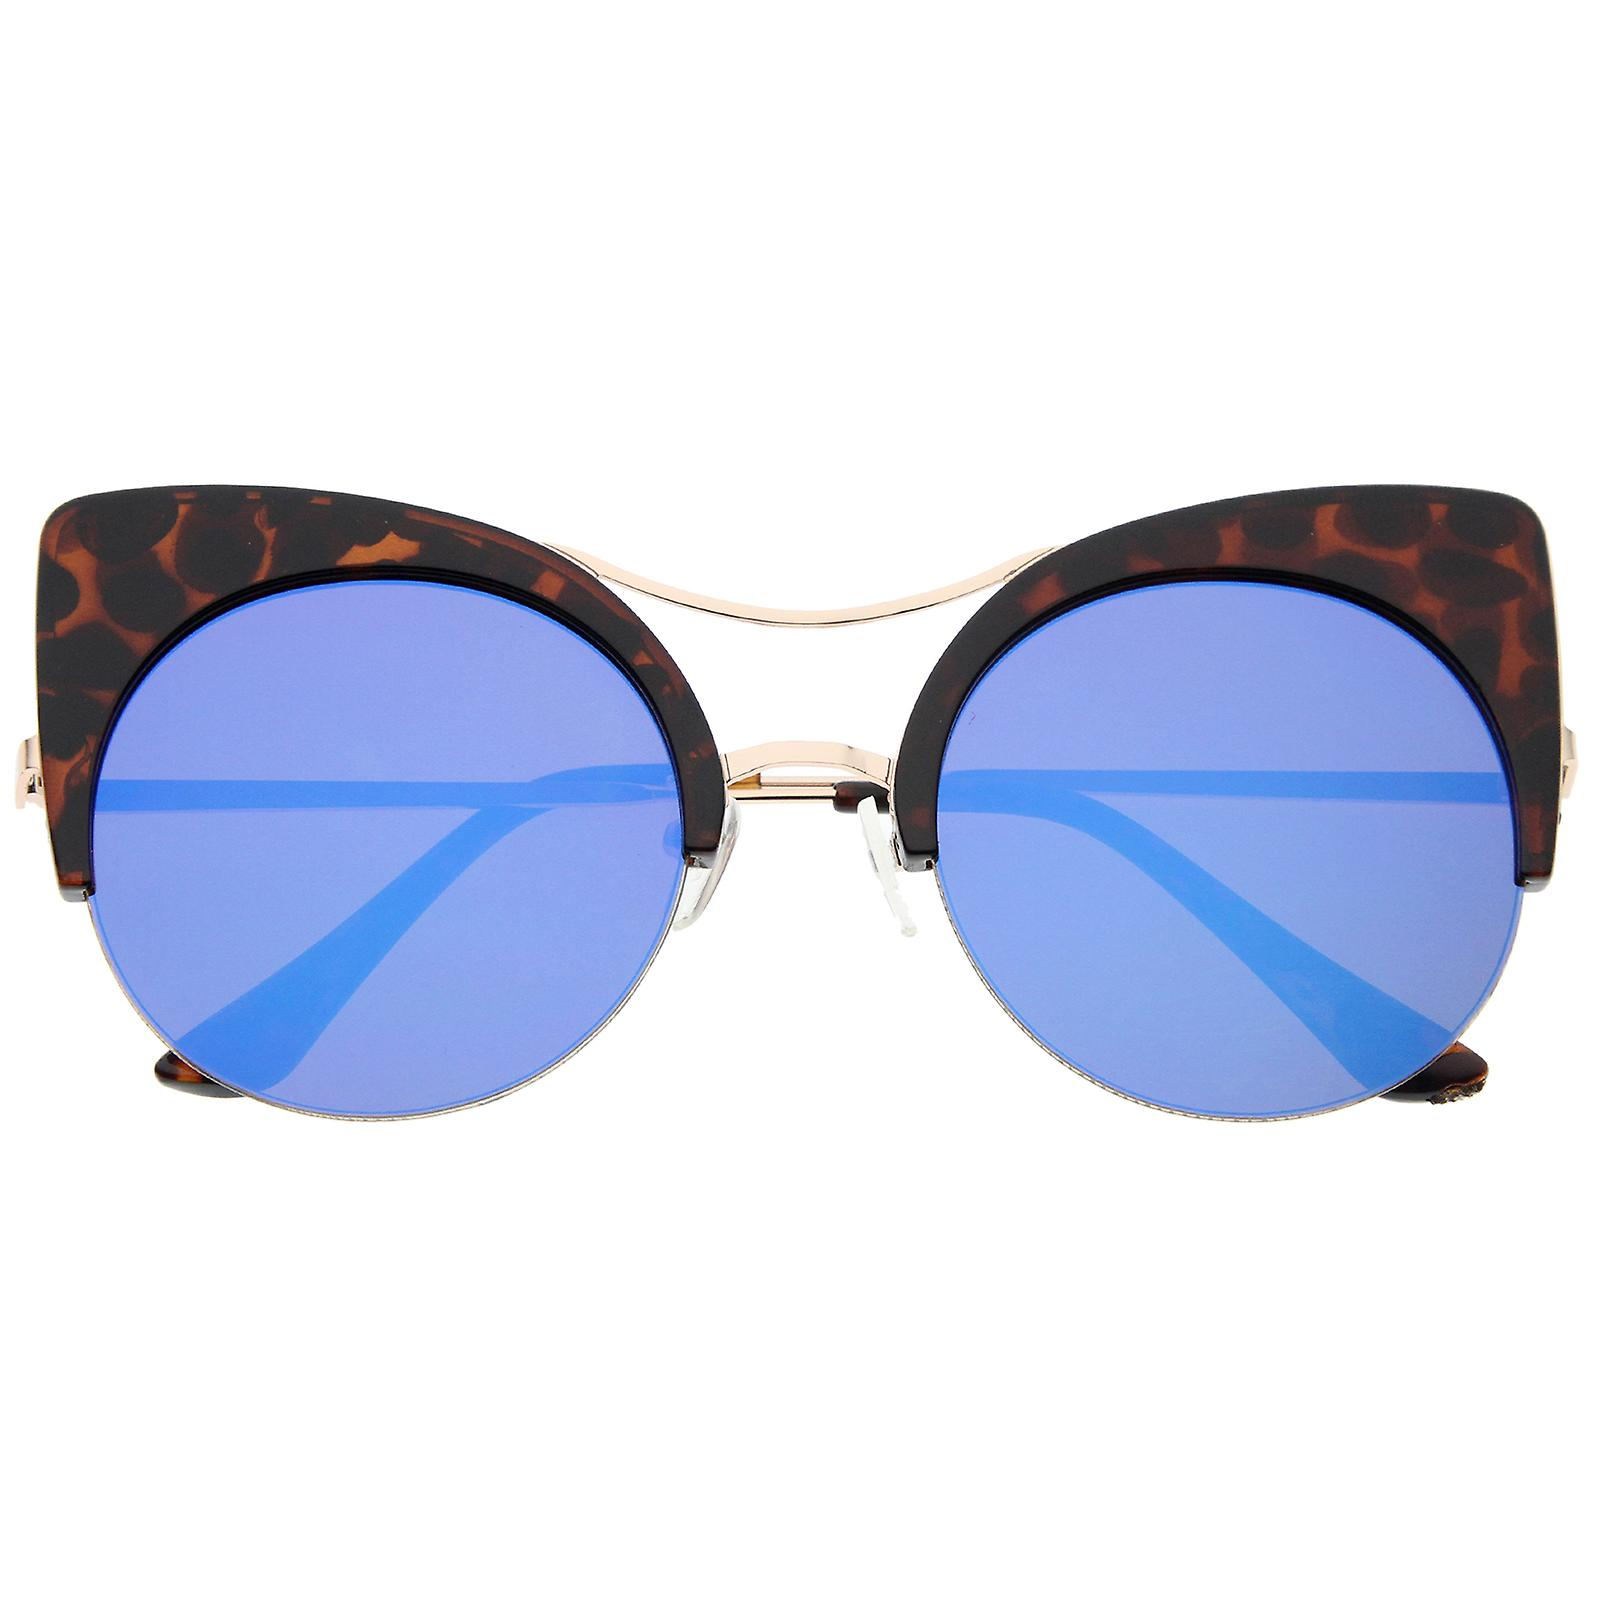 08ba19b924 Womens Oversized Half Frame Semi-Rimless Flat Lens Round Cat Eye Sunglasses  60mm